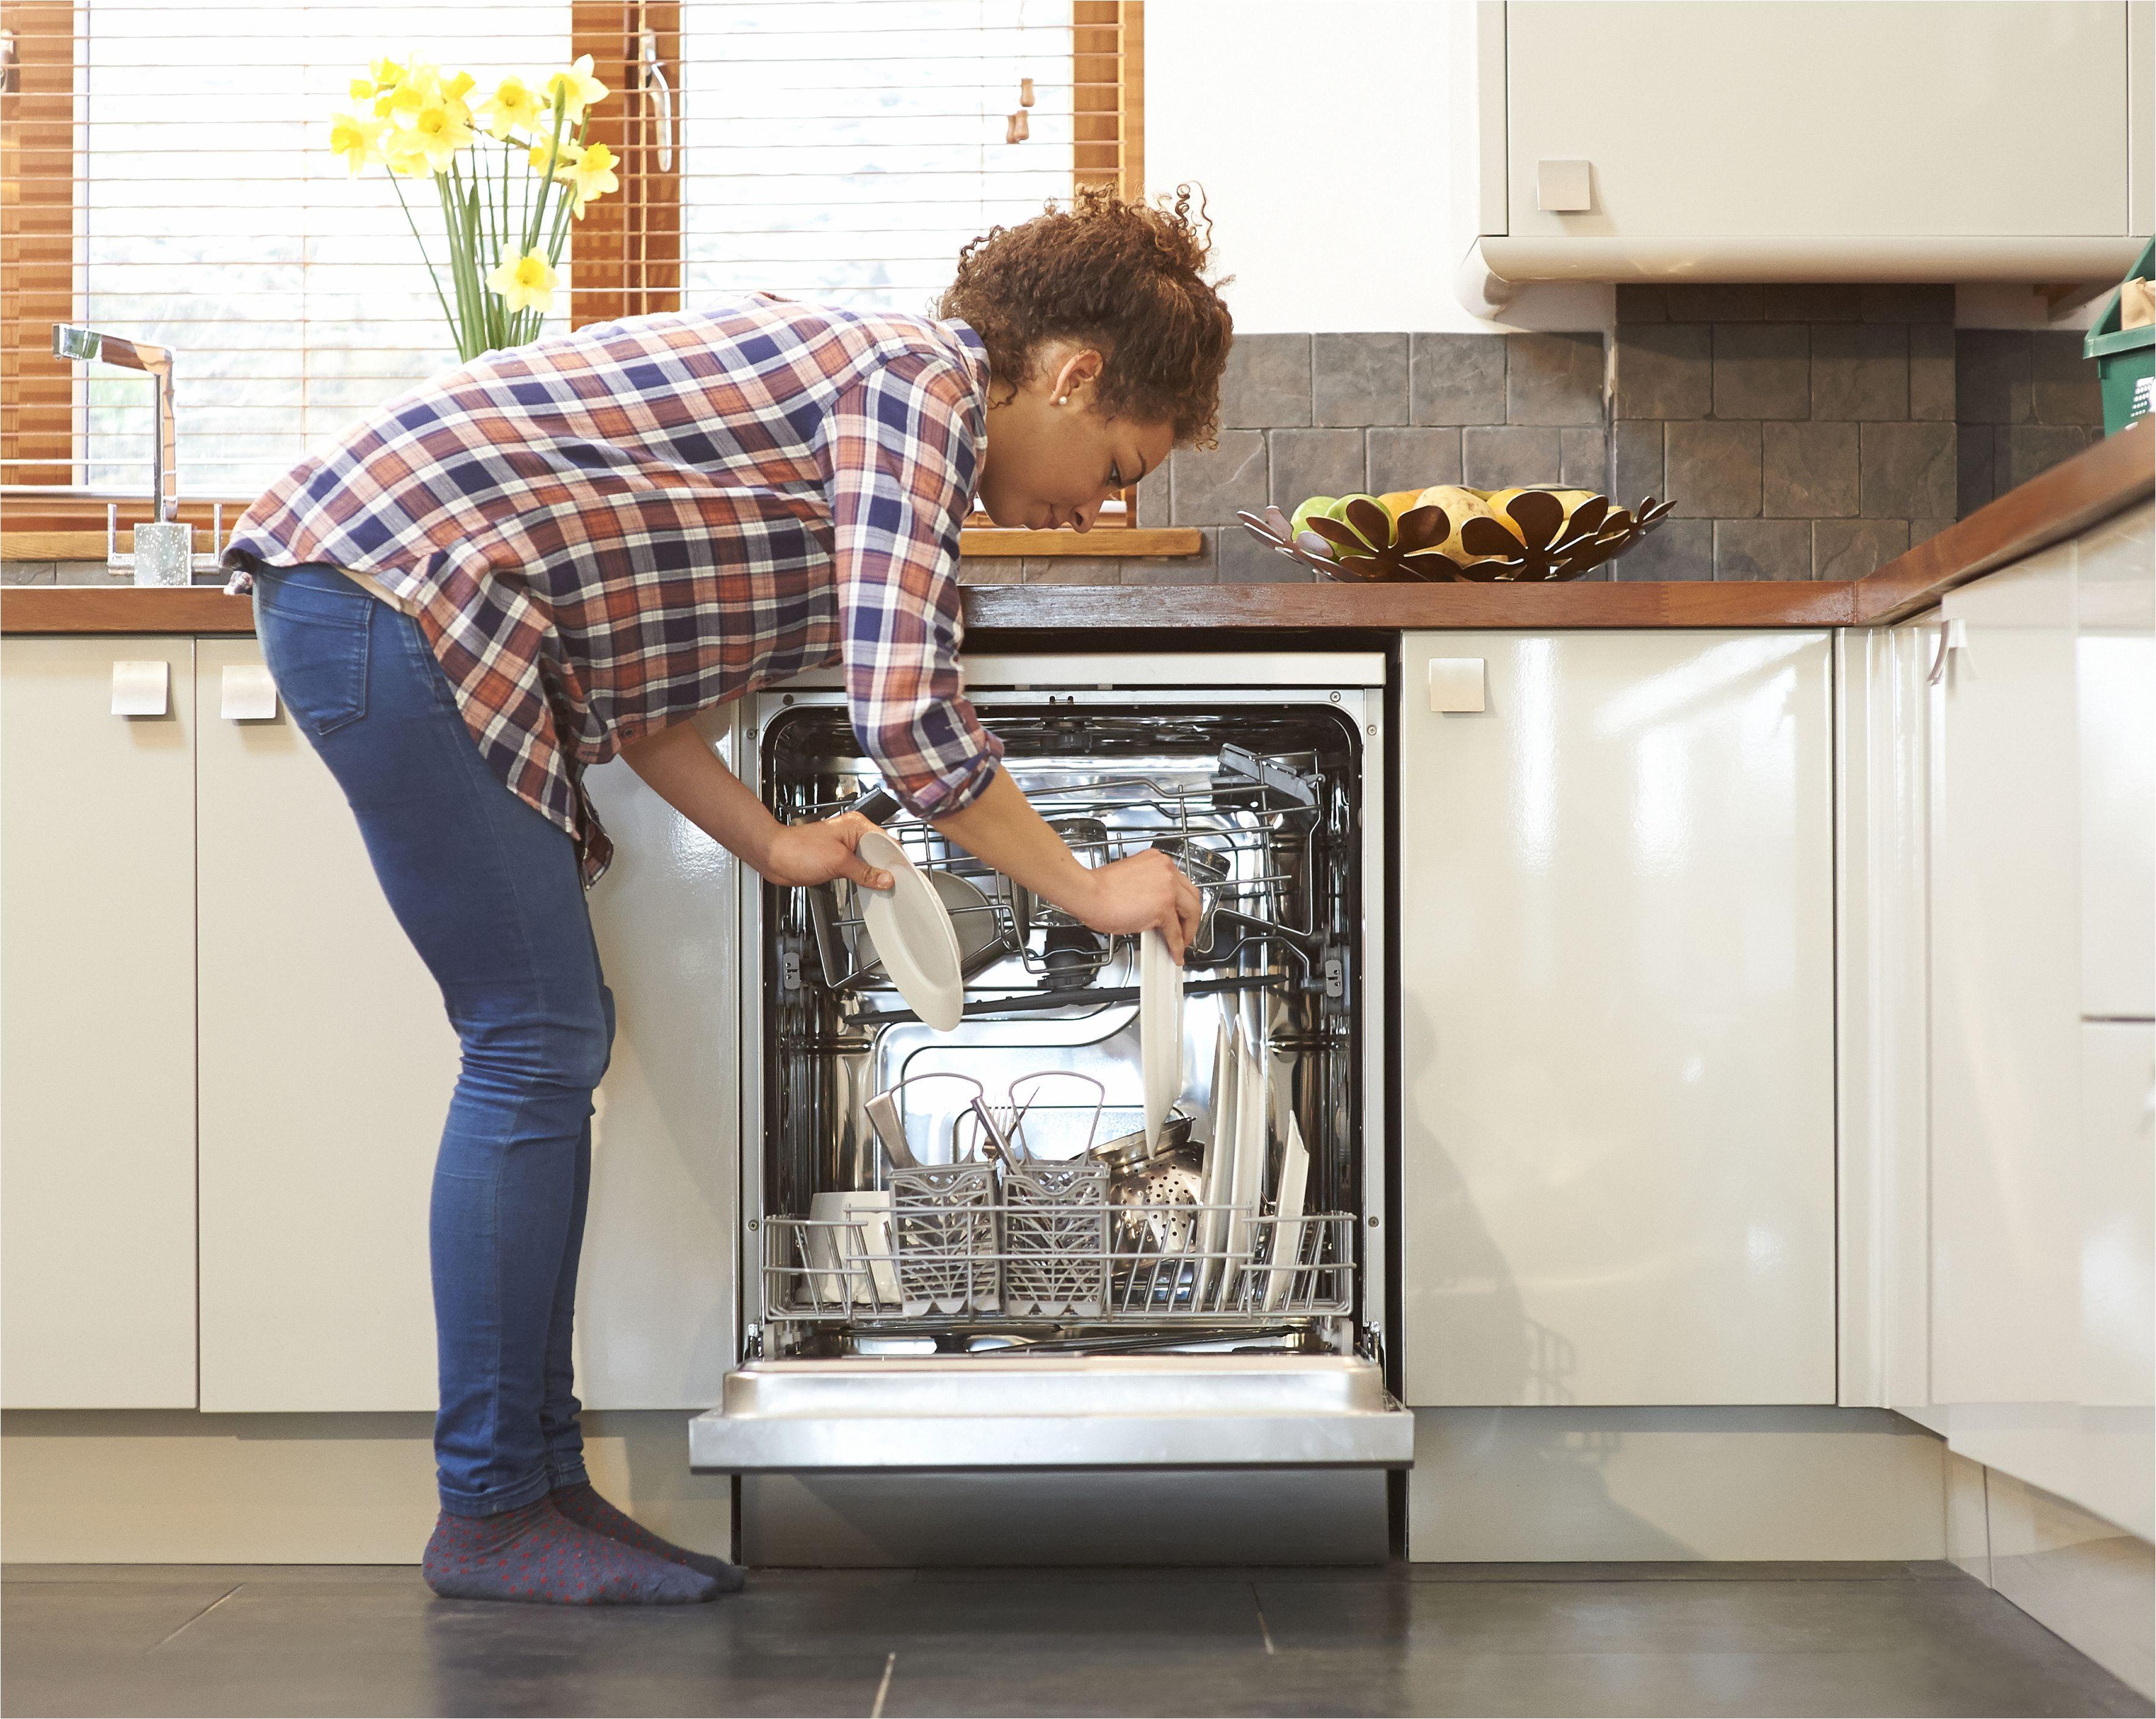 woman unloading dish washer in kitchen 483712233 57969bce3df78ceb8687e547 jpg